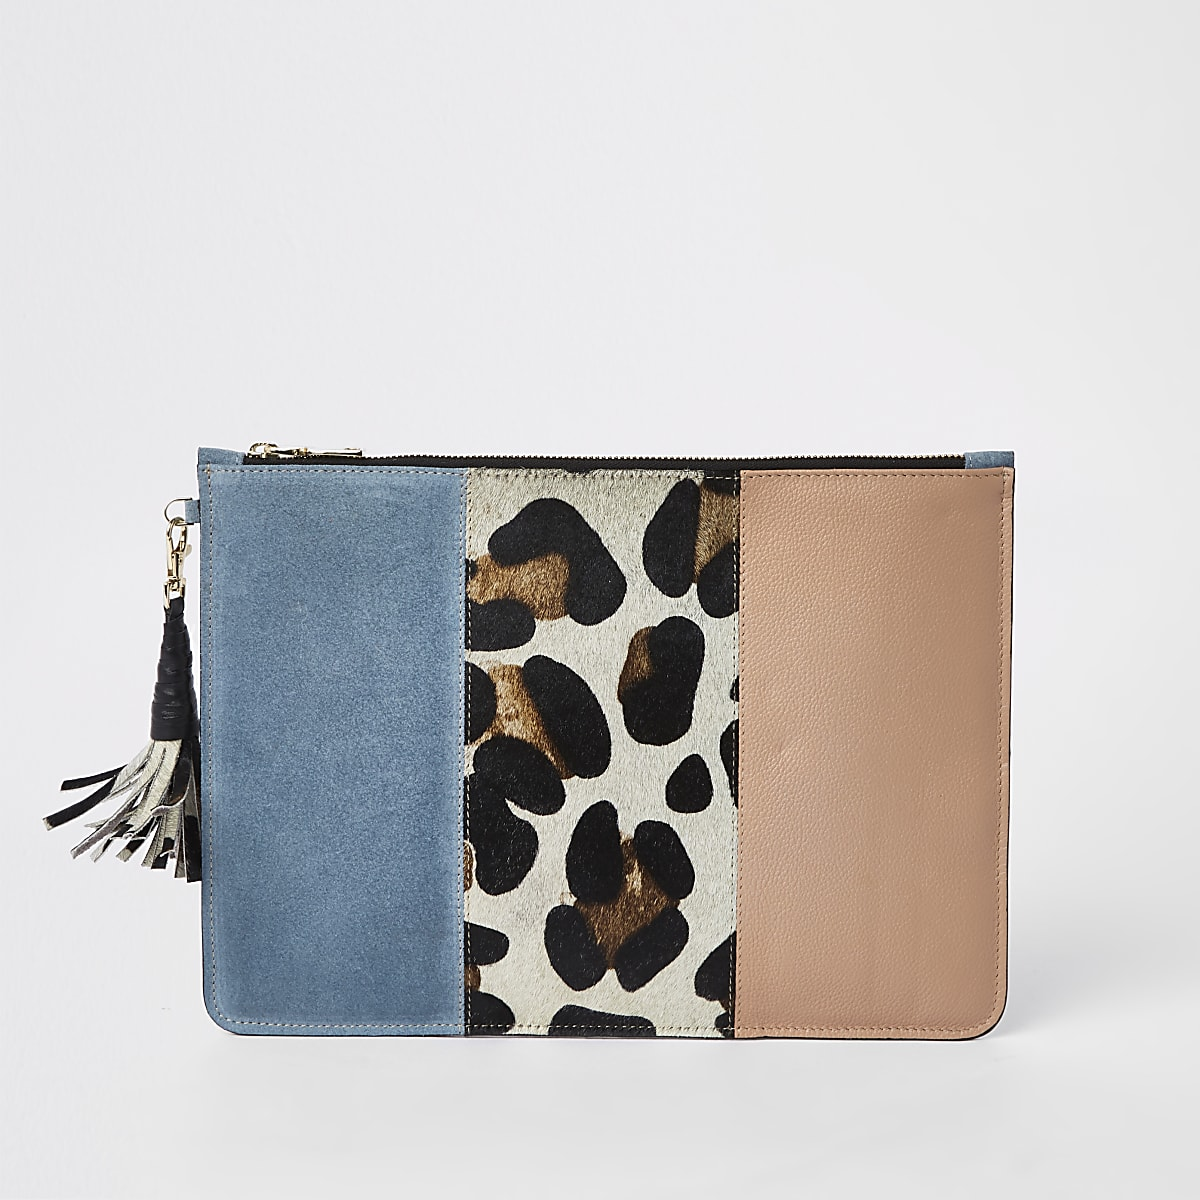 Blue leopard print leather pouch clutch bag